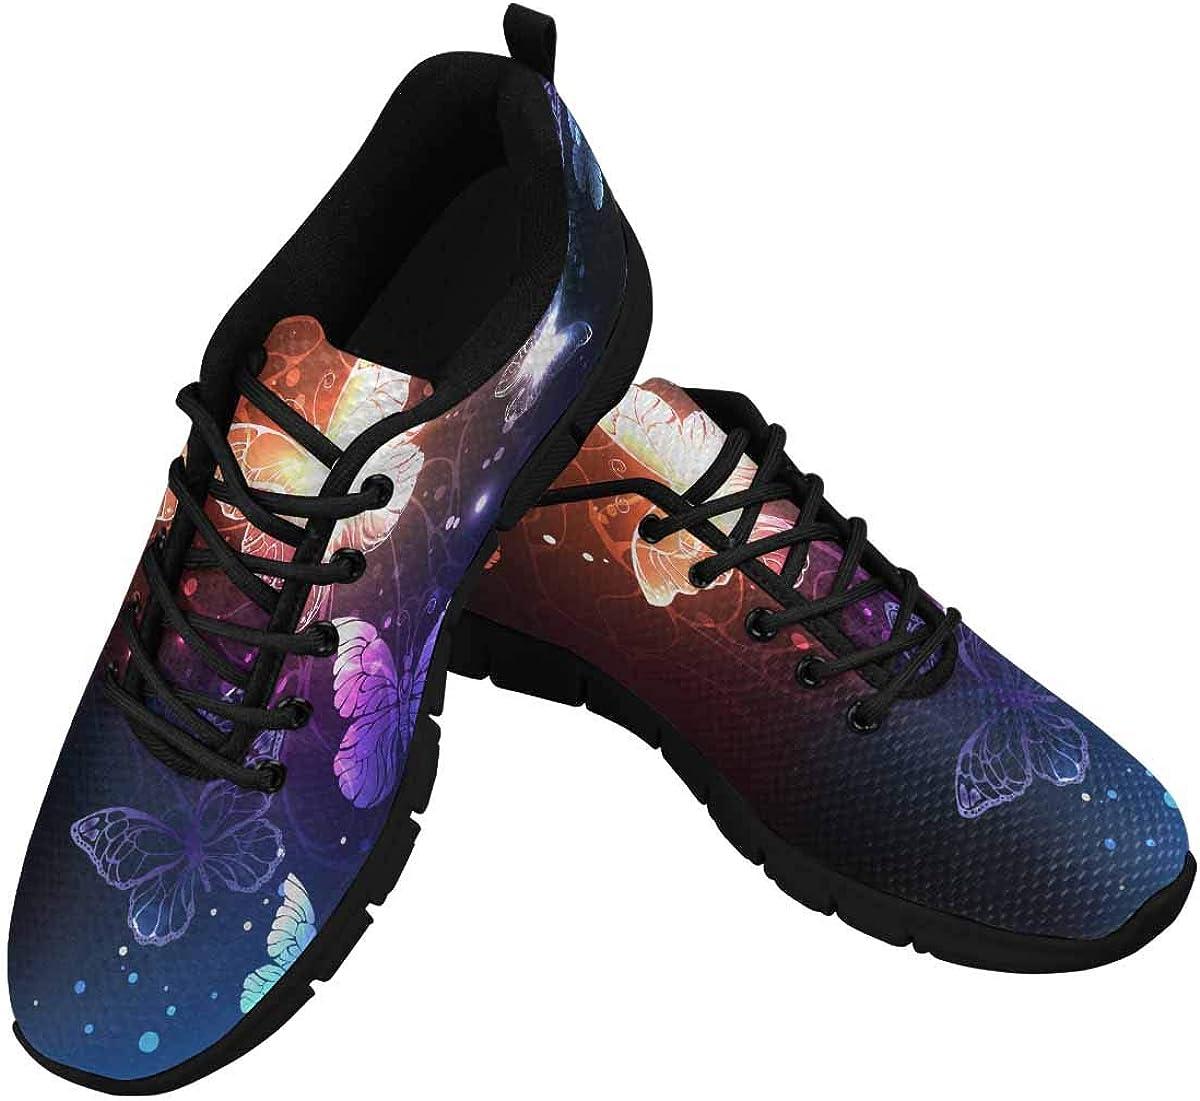 InterestPrint Night Glowing Butterflies Women's Lightweight Sneakers Mesh Breathable Yoga Shoes